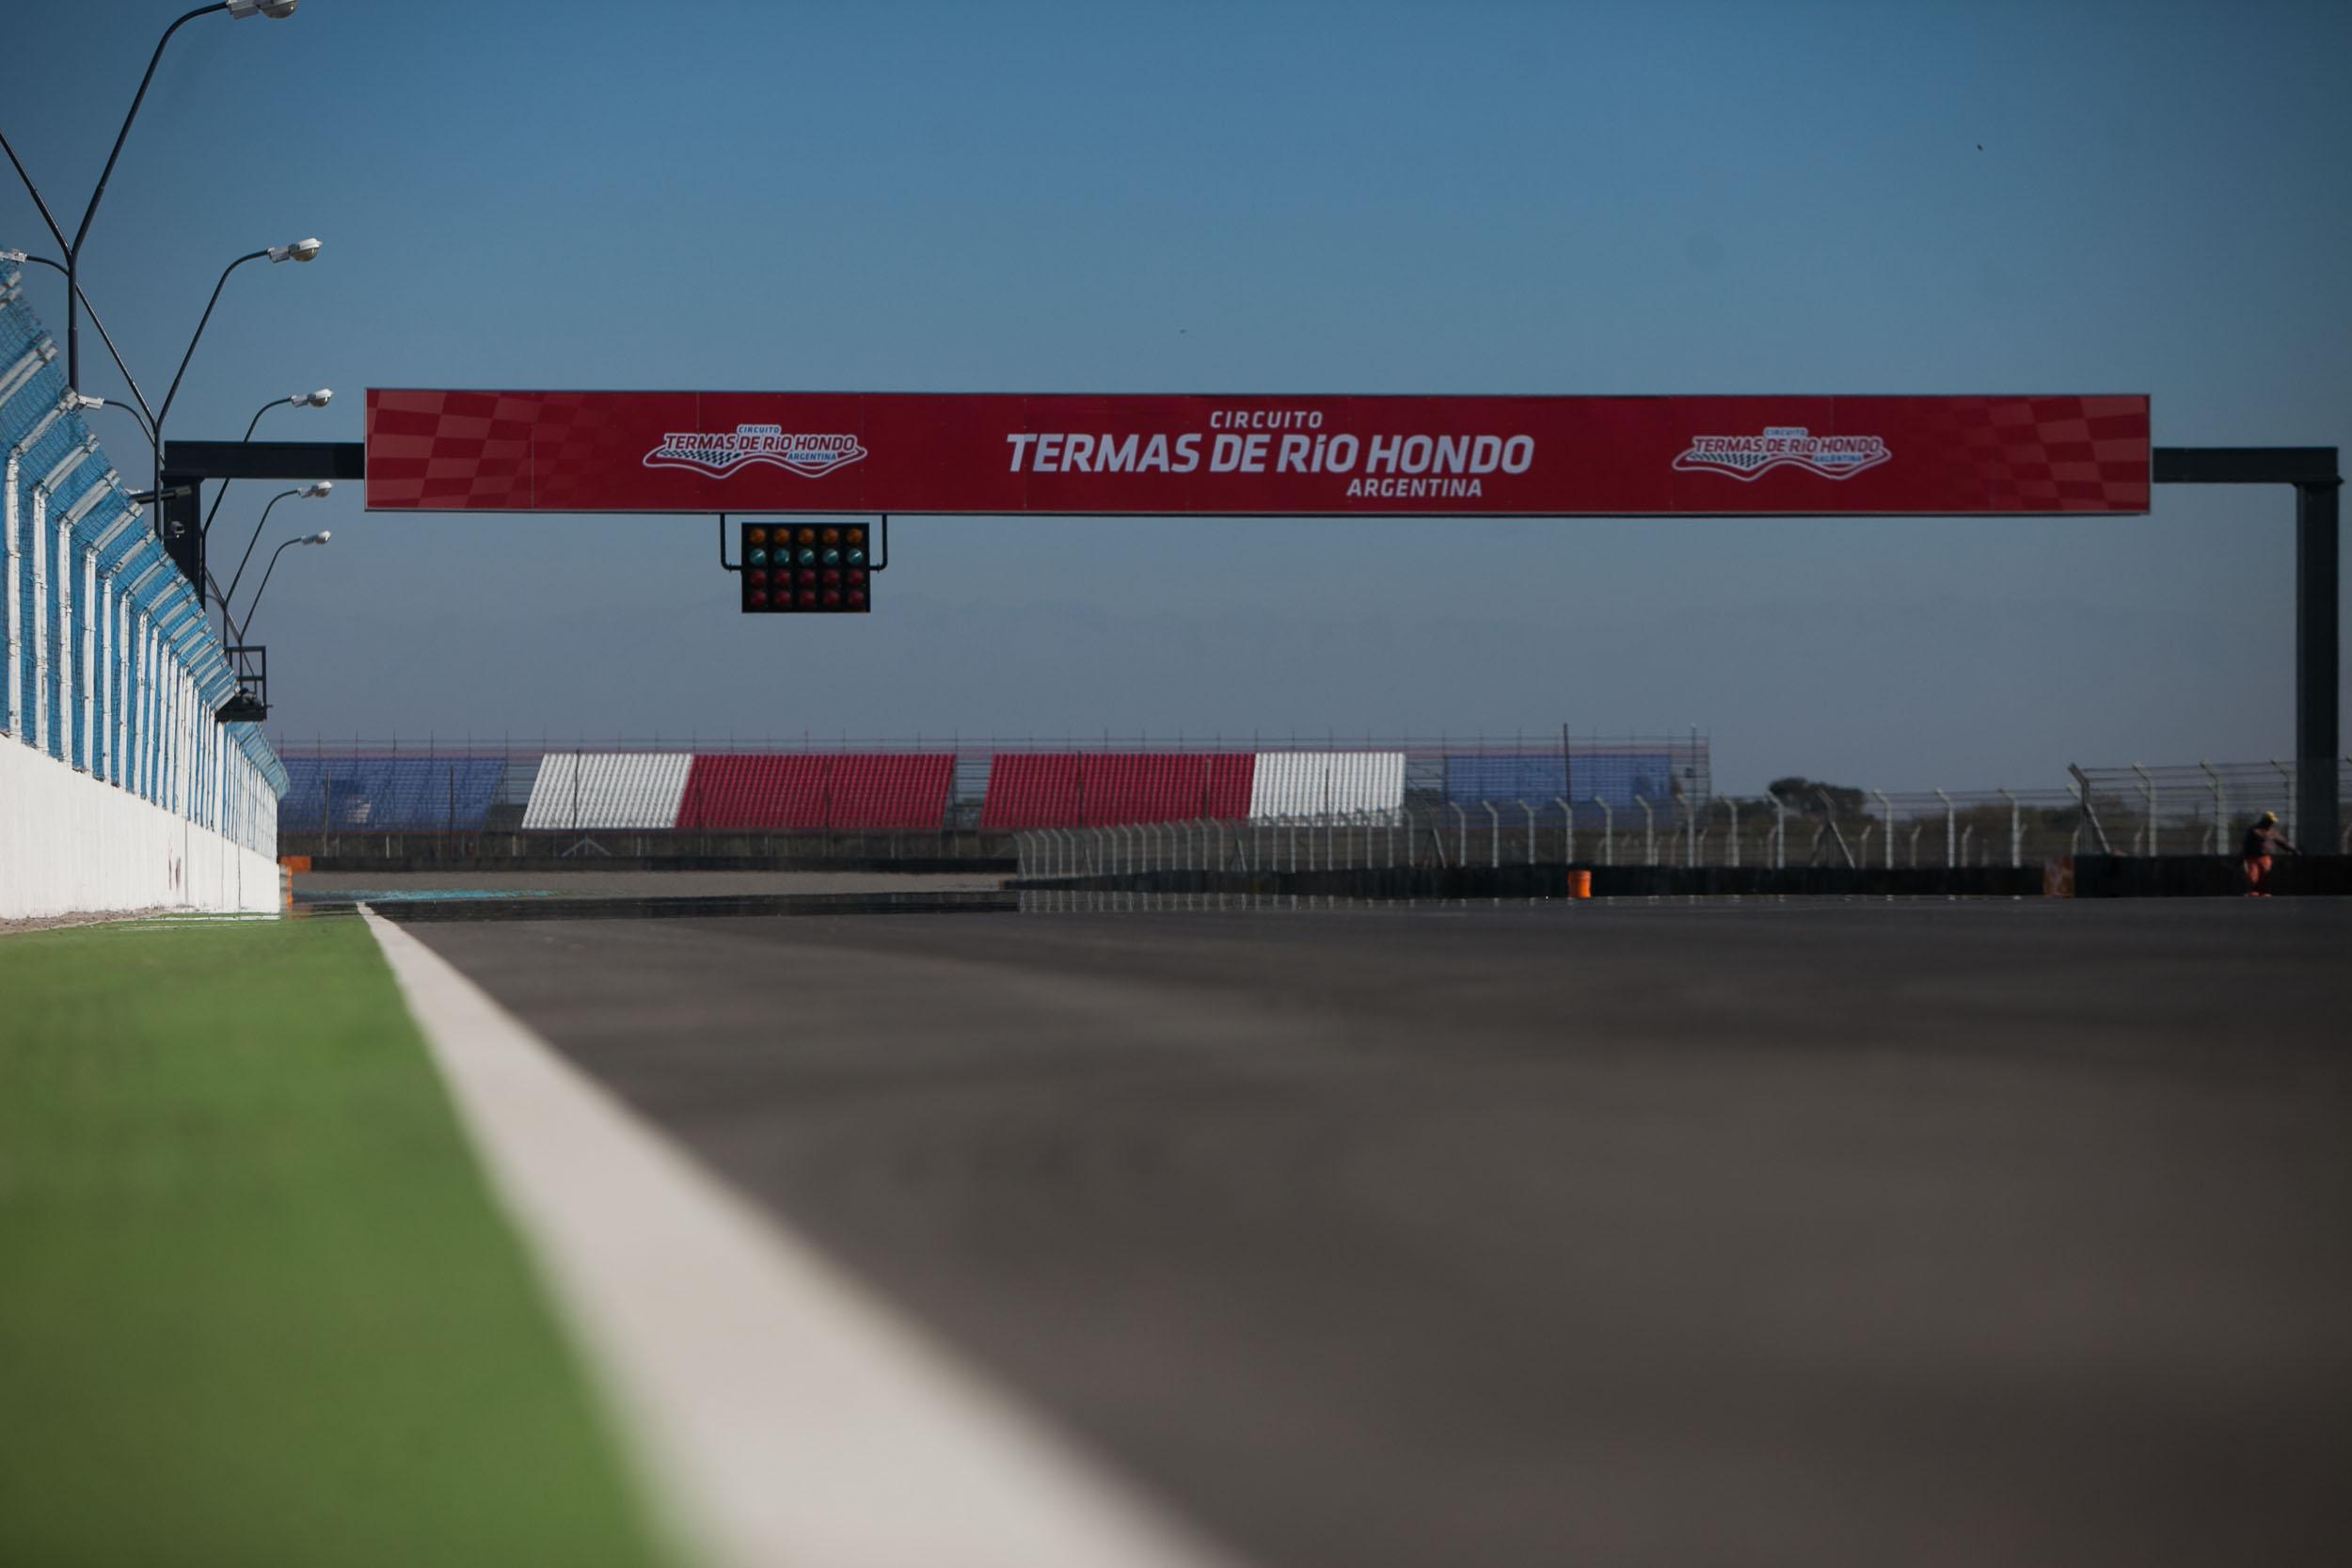 Circuito Termas De Rio Hondo : Calendario motogp in argentina per anni